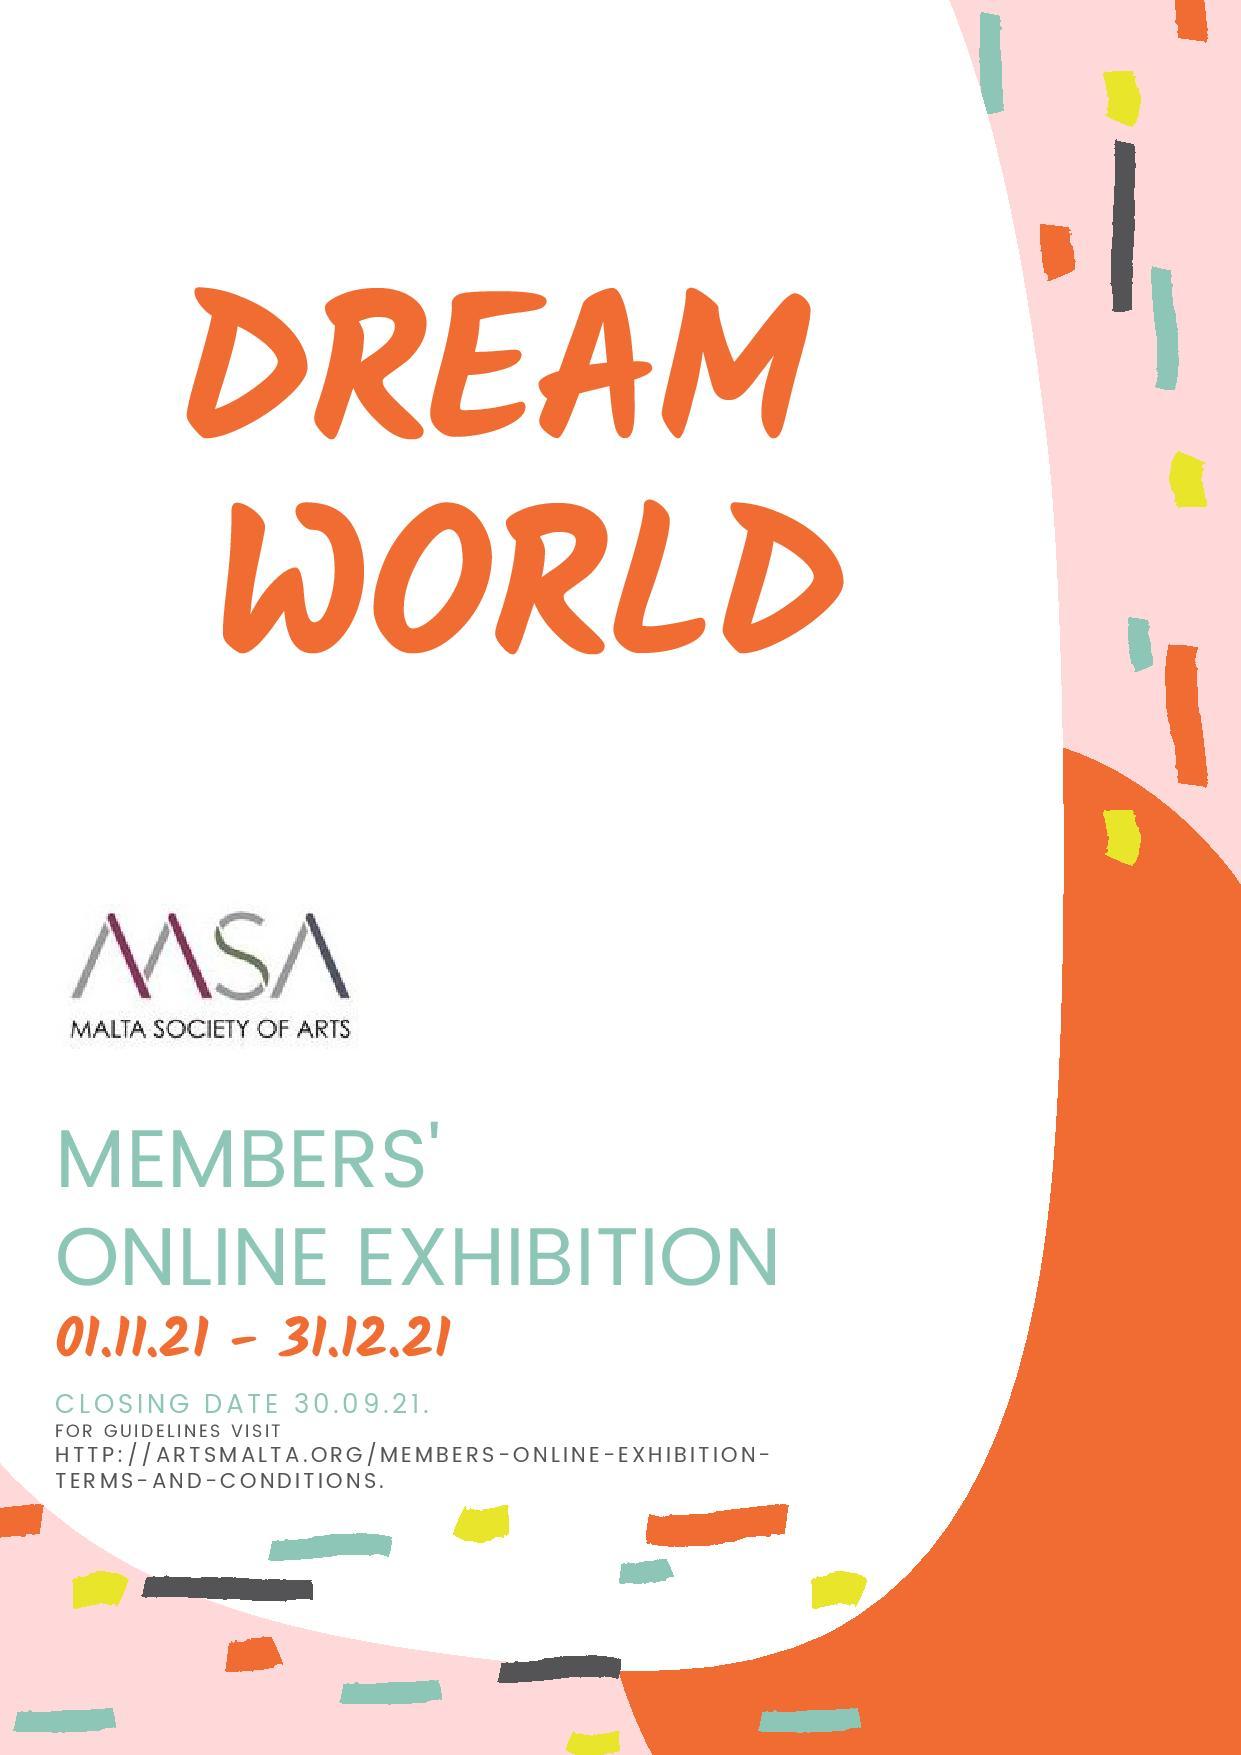 Members online exhibition poster